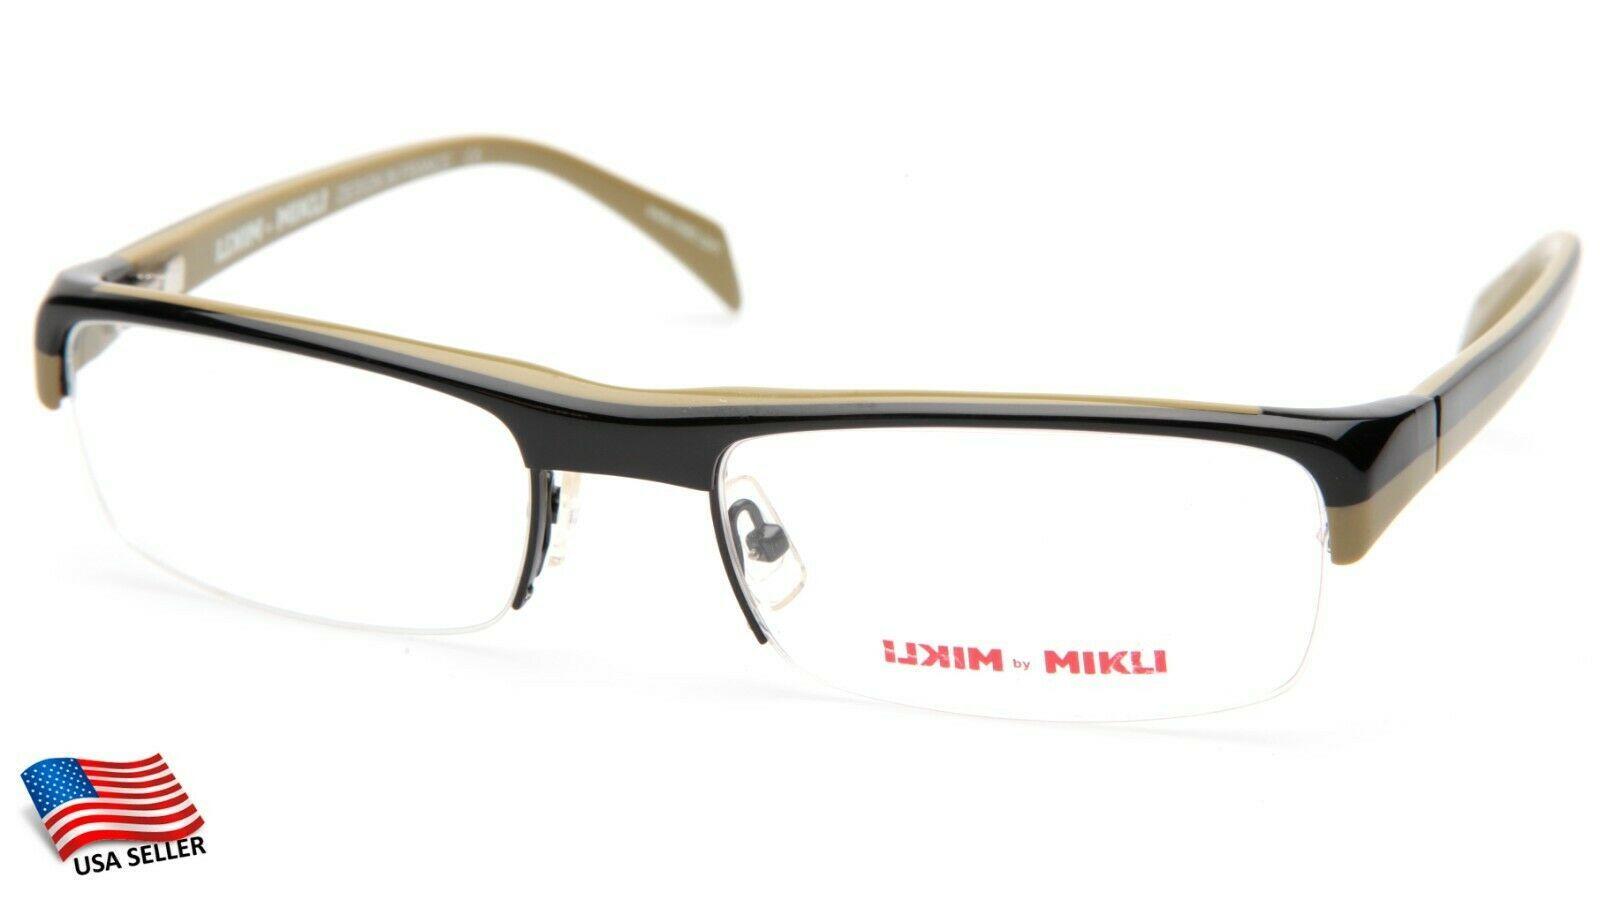 NEW Alain Mikli ML 1003 0001 BLACK/OLIVE EYEGLASSES FRAME 56-19-133mm B30mm - $84.14